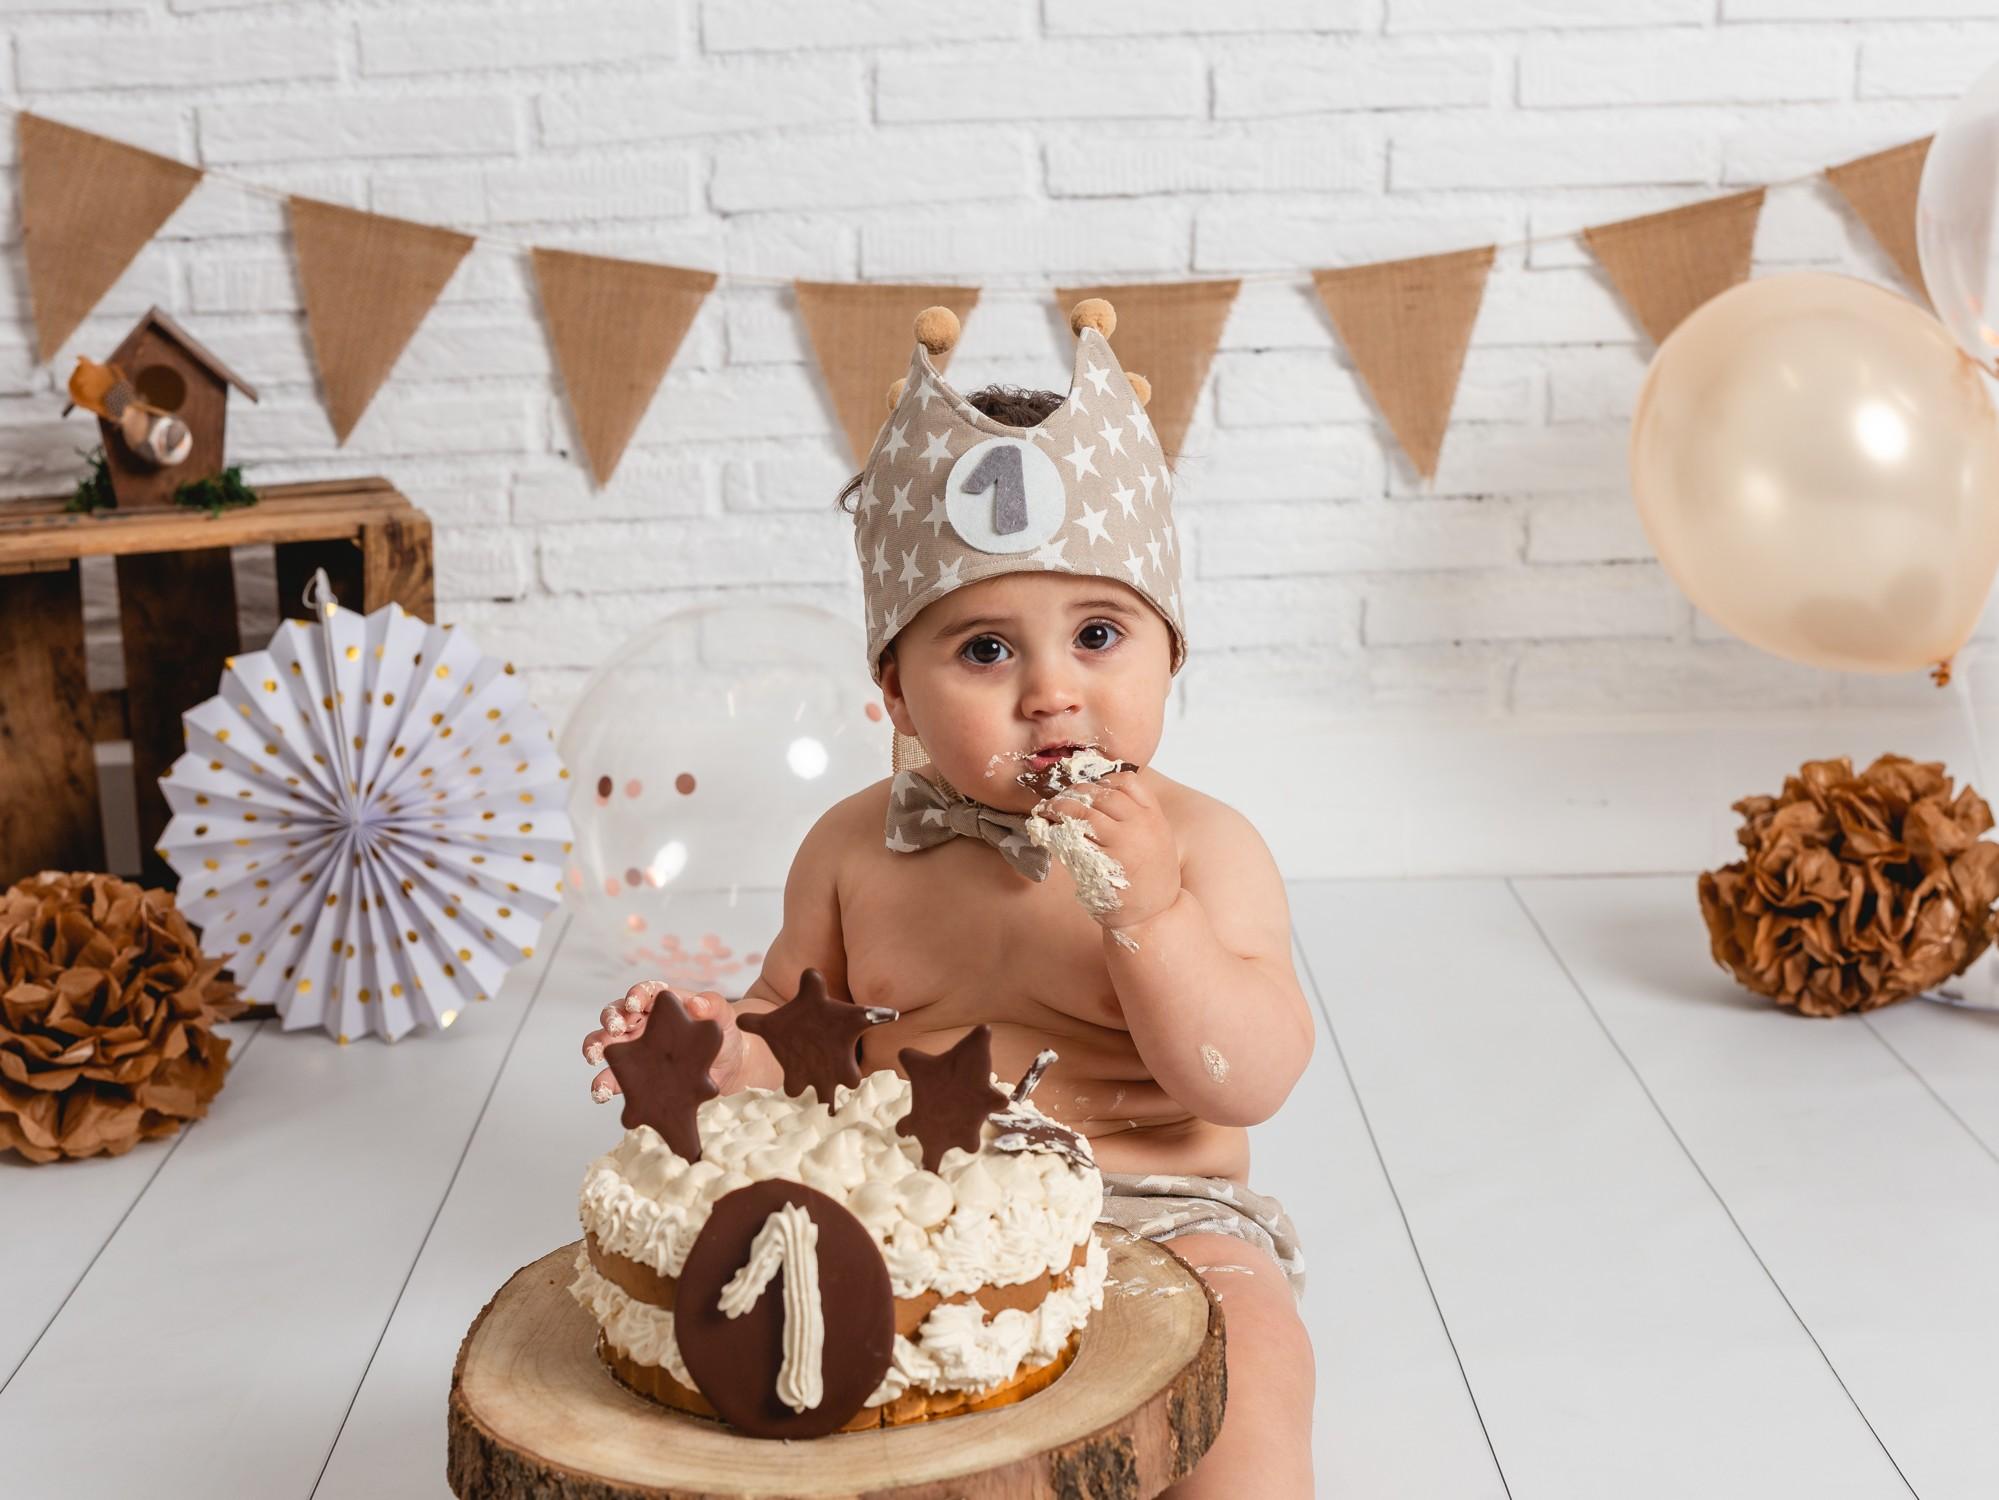 Adrian cake smash-13